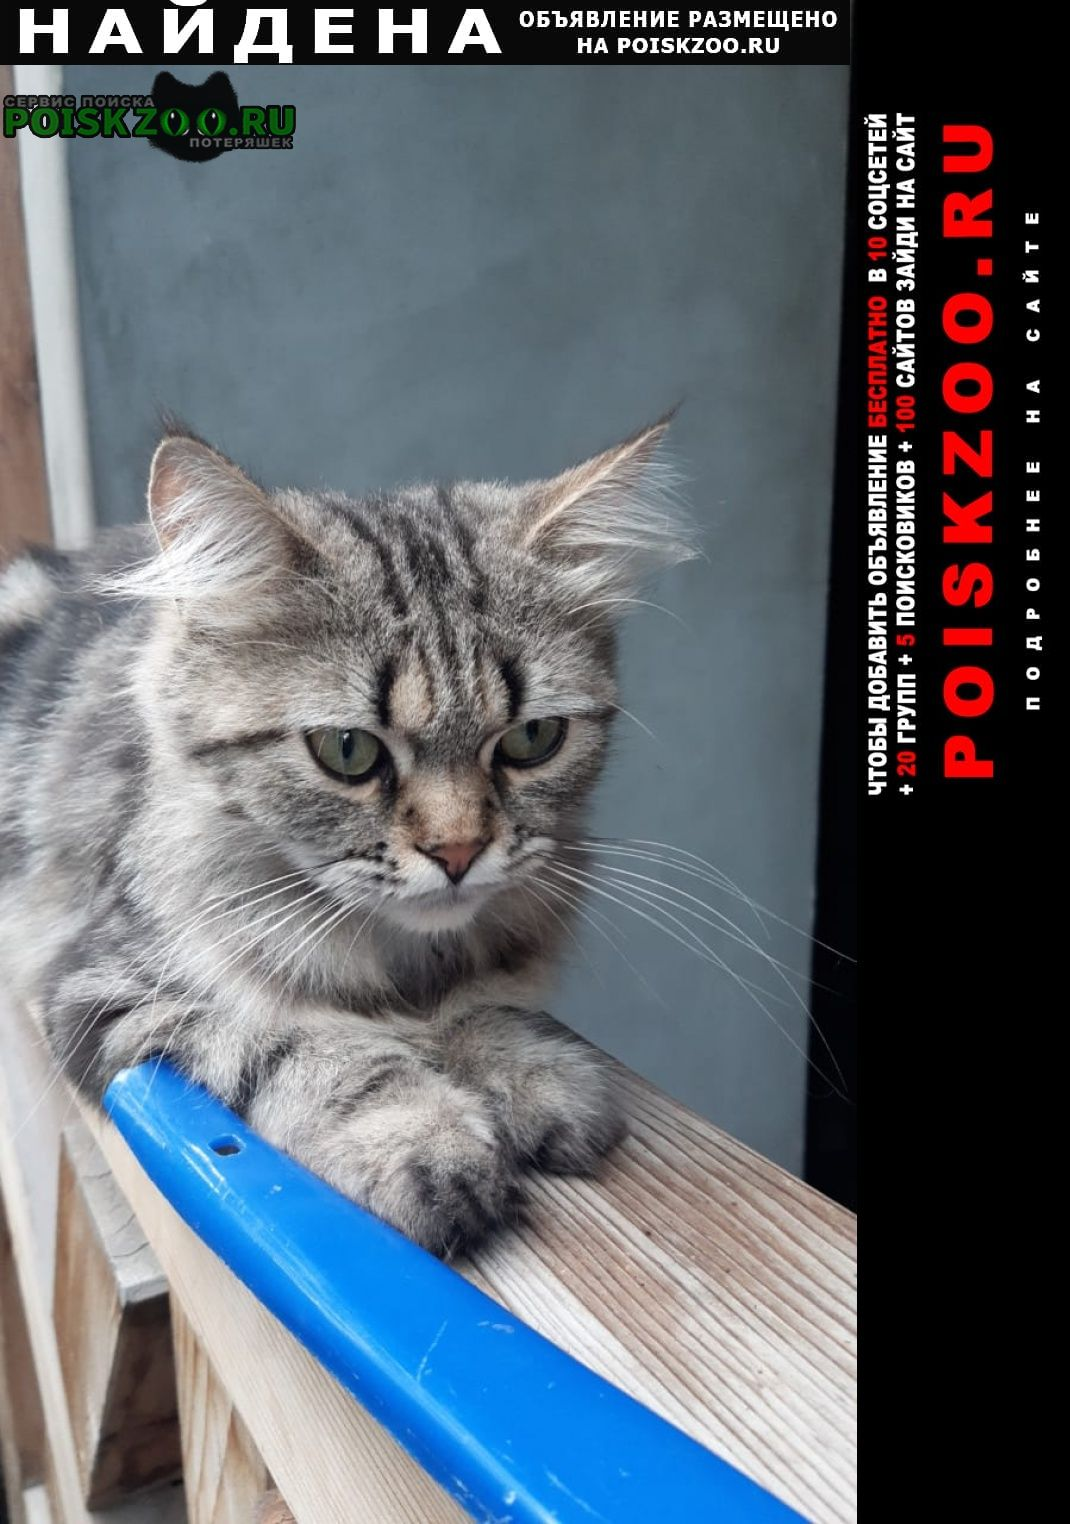 Найдена кошка 17 августа приблудилась кошечка, чистая Кисловодск